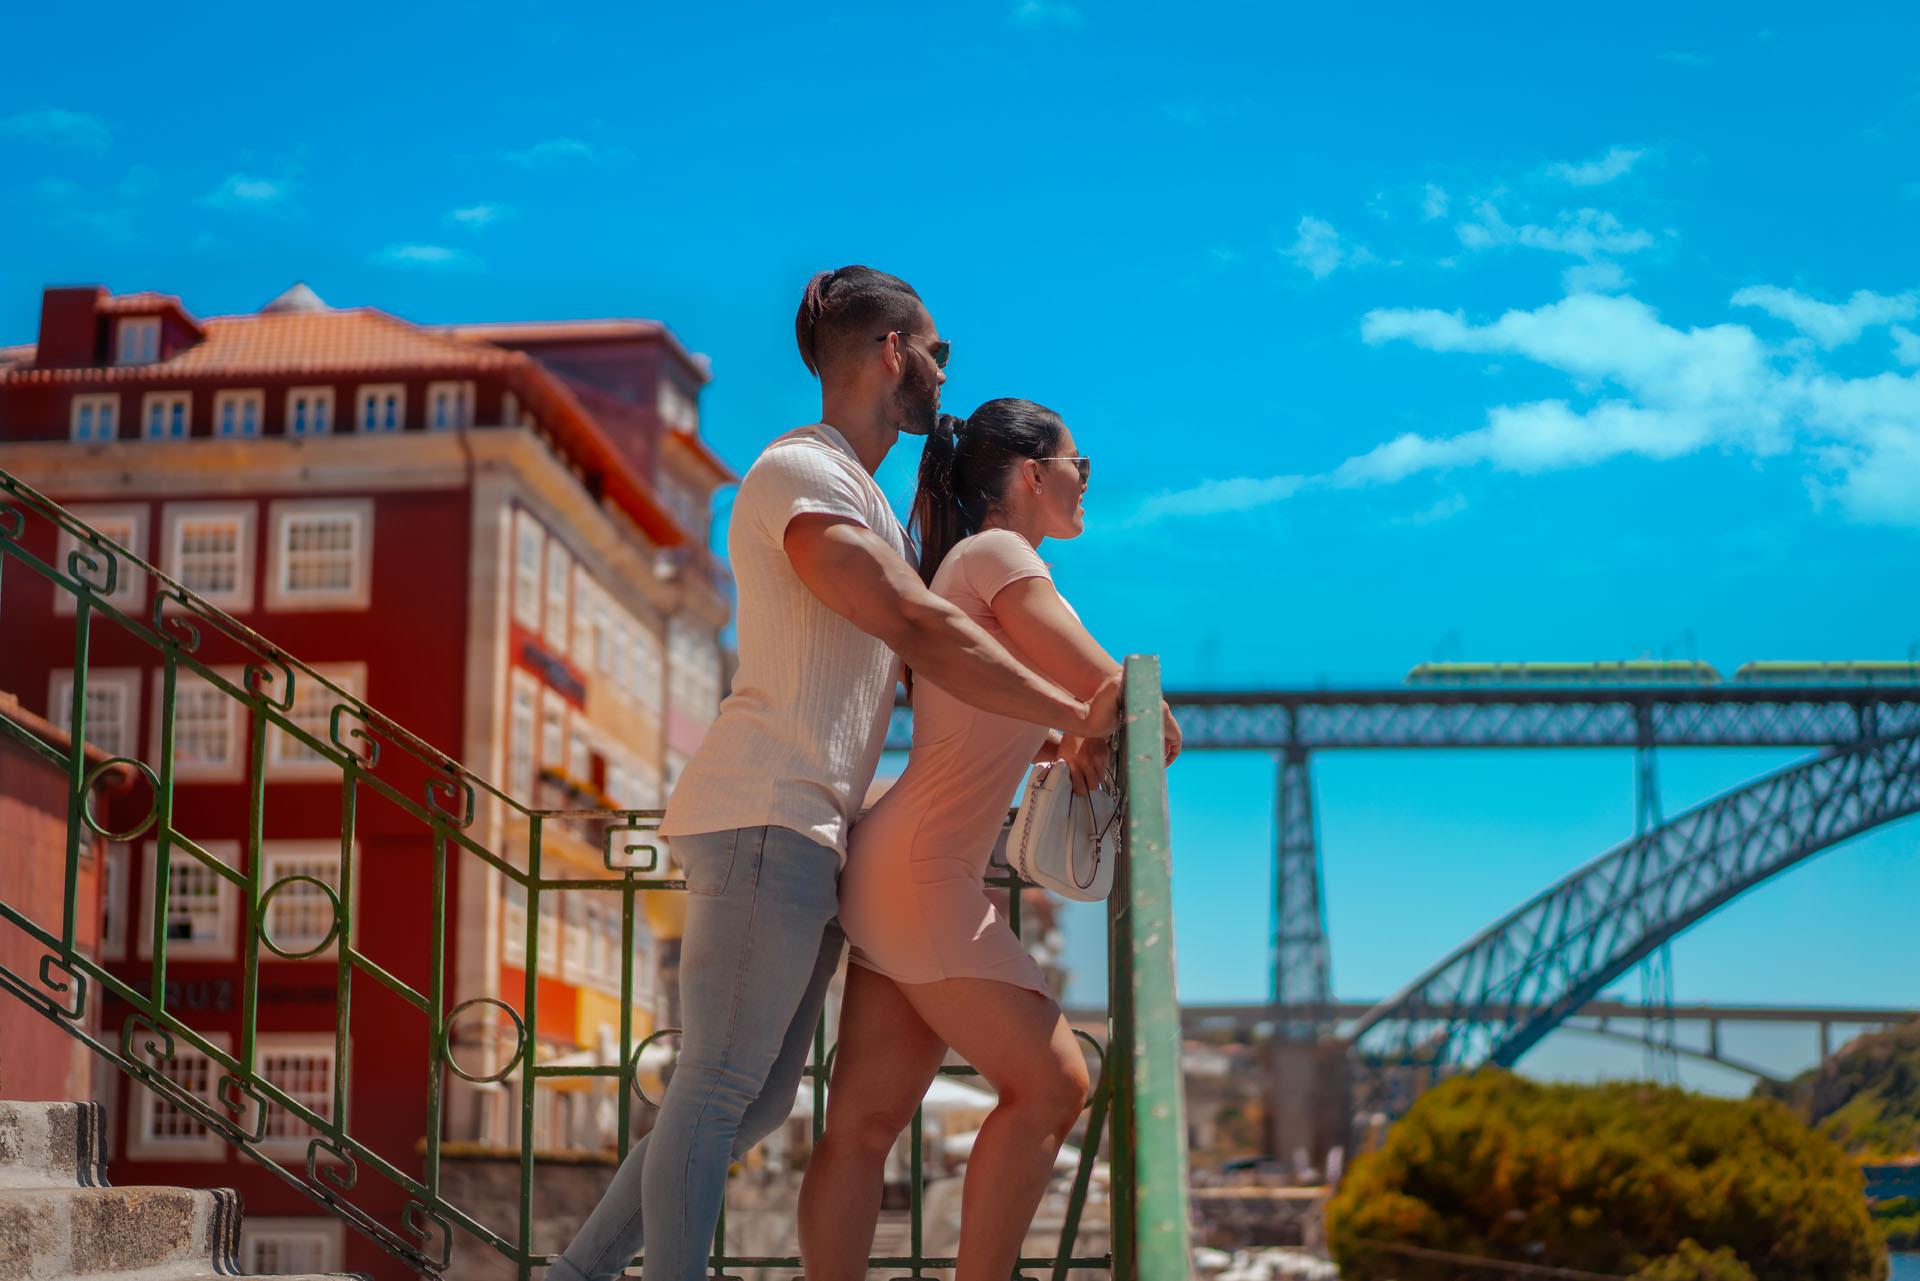 2019-05-30 - Kara & Guilhem - Porto - 09517 - 1920px